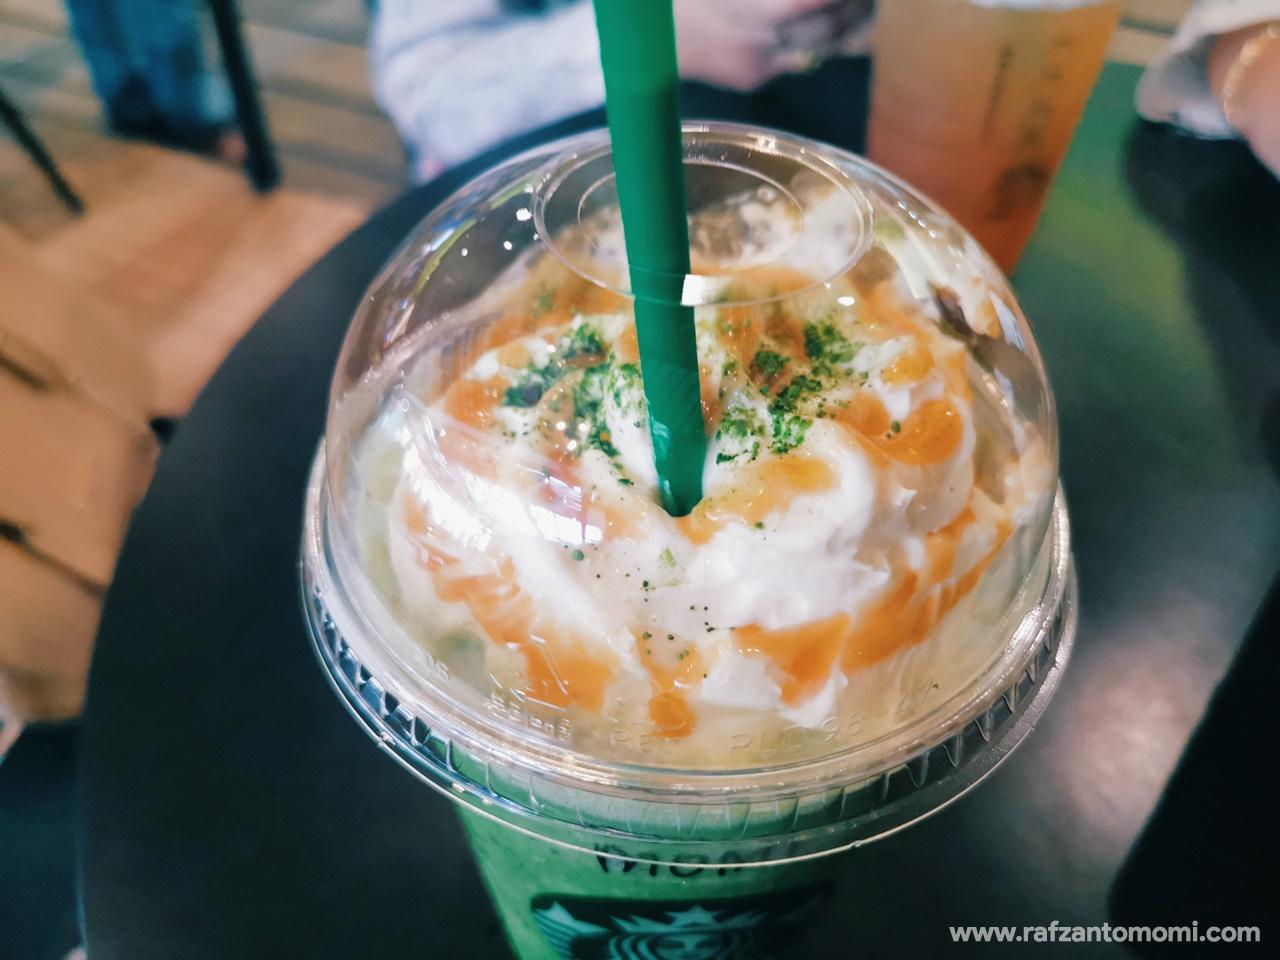 Starbucks Caramel Pure Matcha Choc Chip Frappuccino